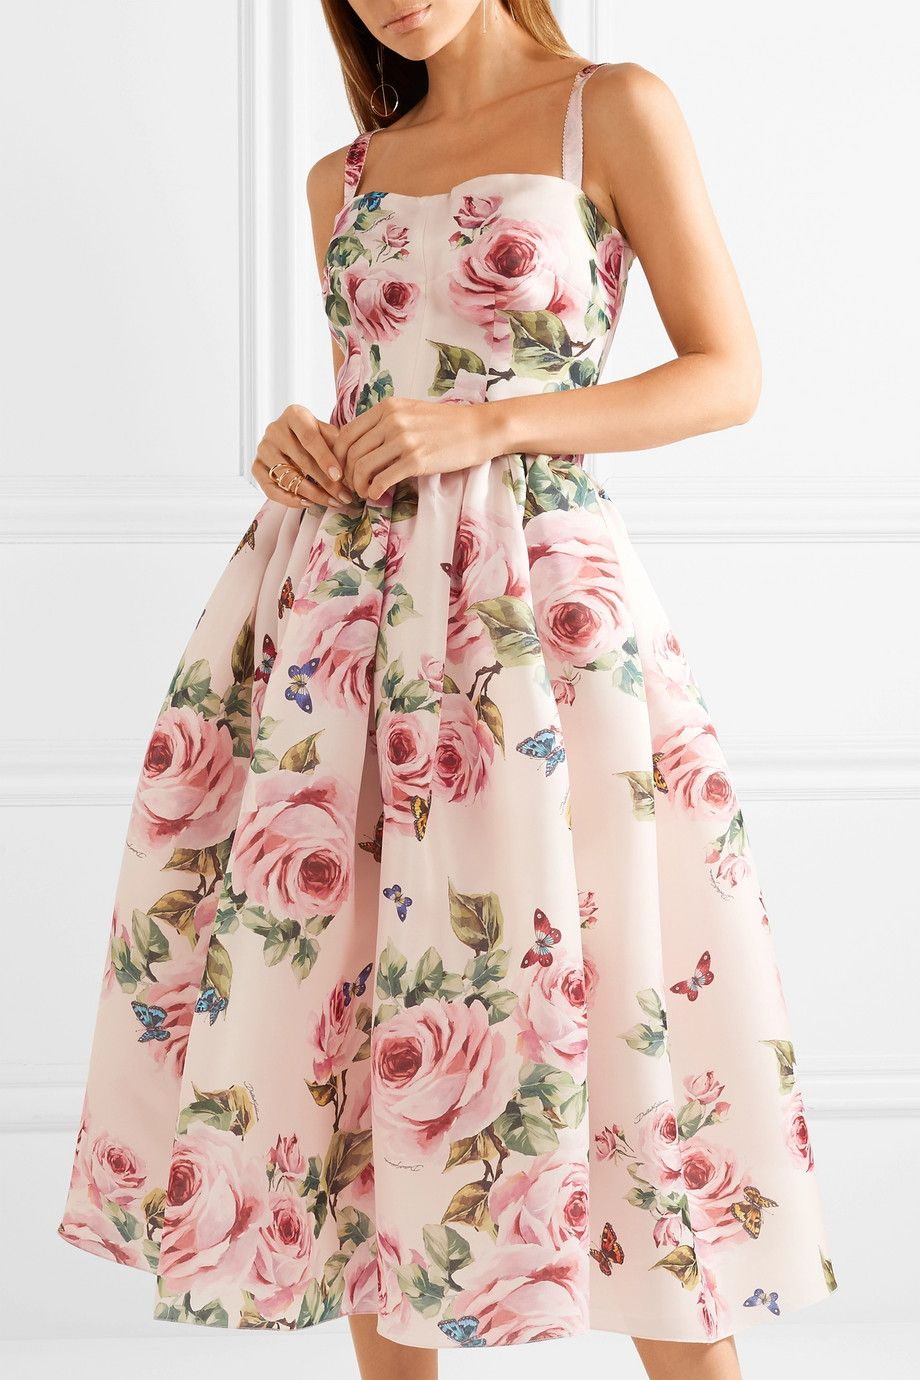 acbf24a11393 Dolce & Gabbana | Pleated floral-print silk-organza midi dress |  NET-A-PORTER.COM